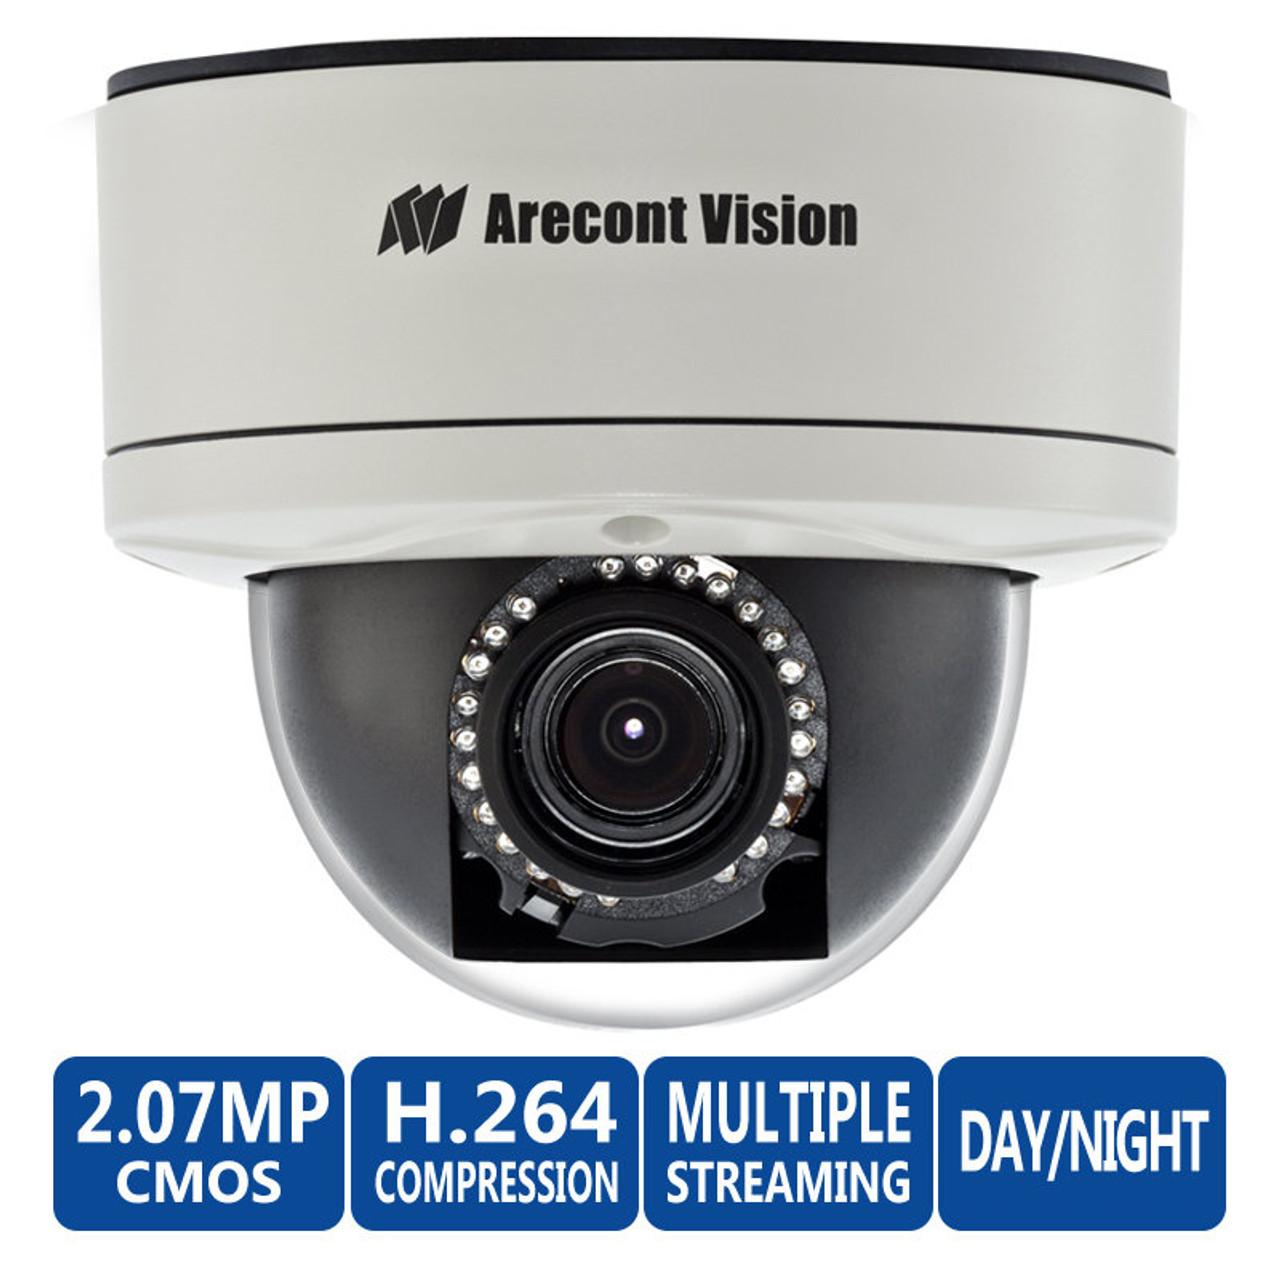 ARECONT VISION AV2255AMIR-A IP CAMERA WINDOWS XP DRIVER